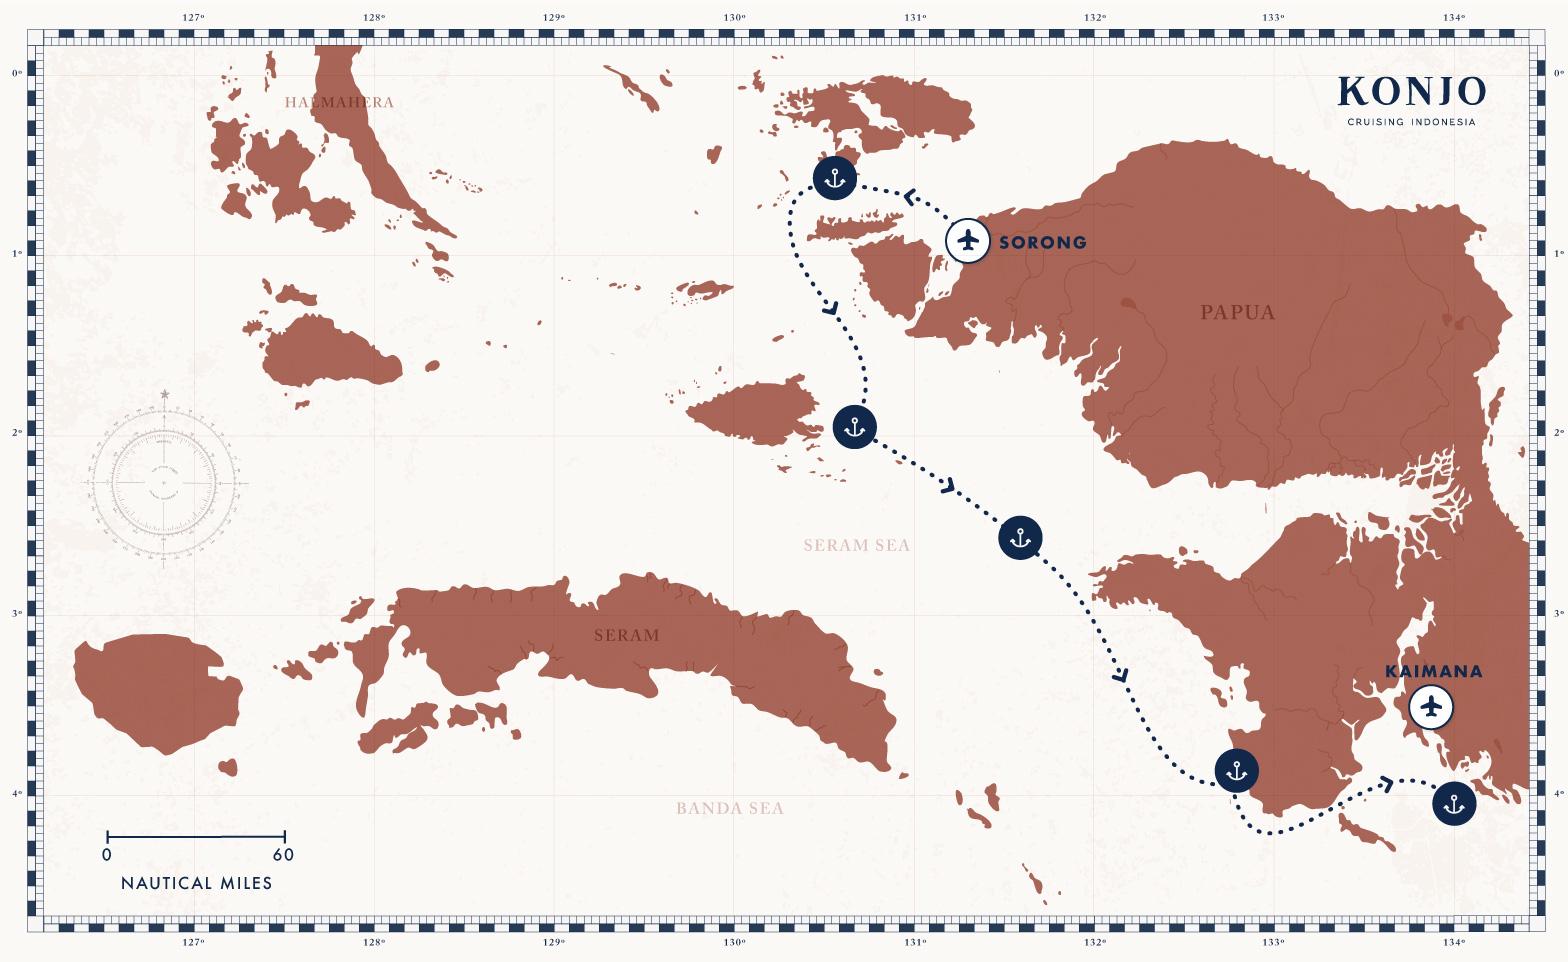 cruising diving raja ampat Tritonbay divingliveaboard konjocruising offthebeatenpath